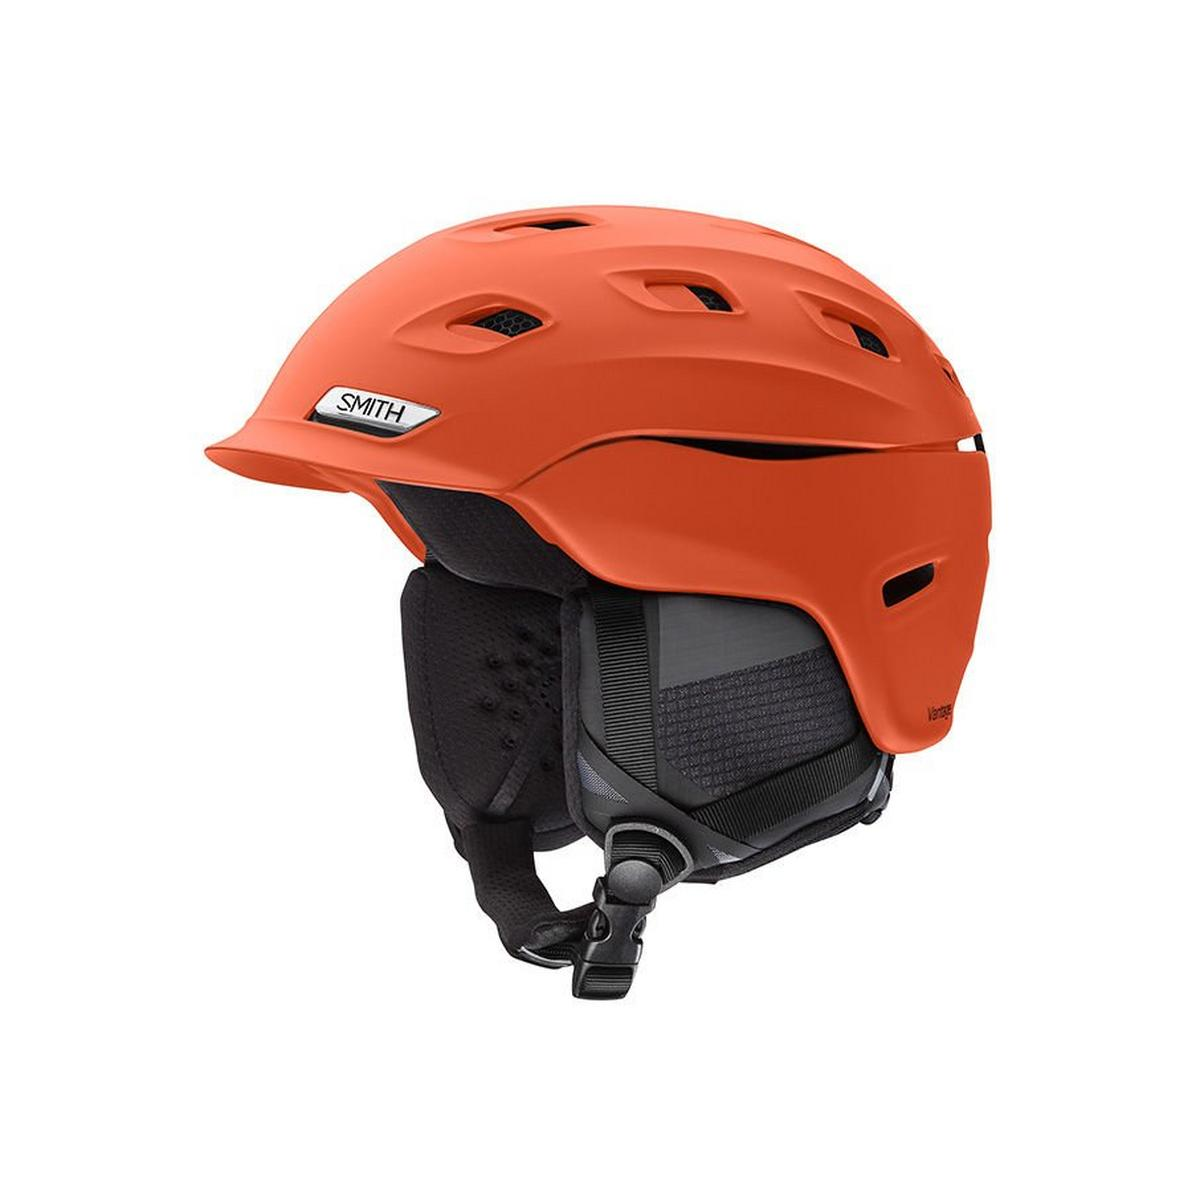 Smith Optics Men's Vantage Helmet